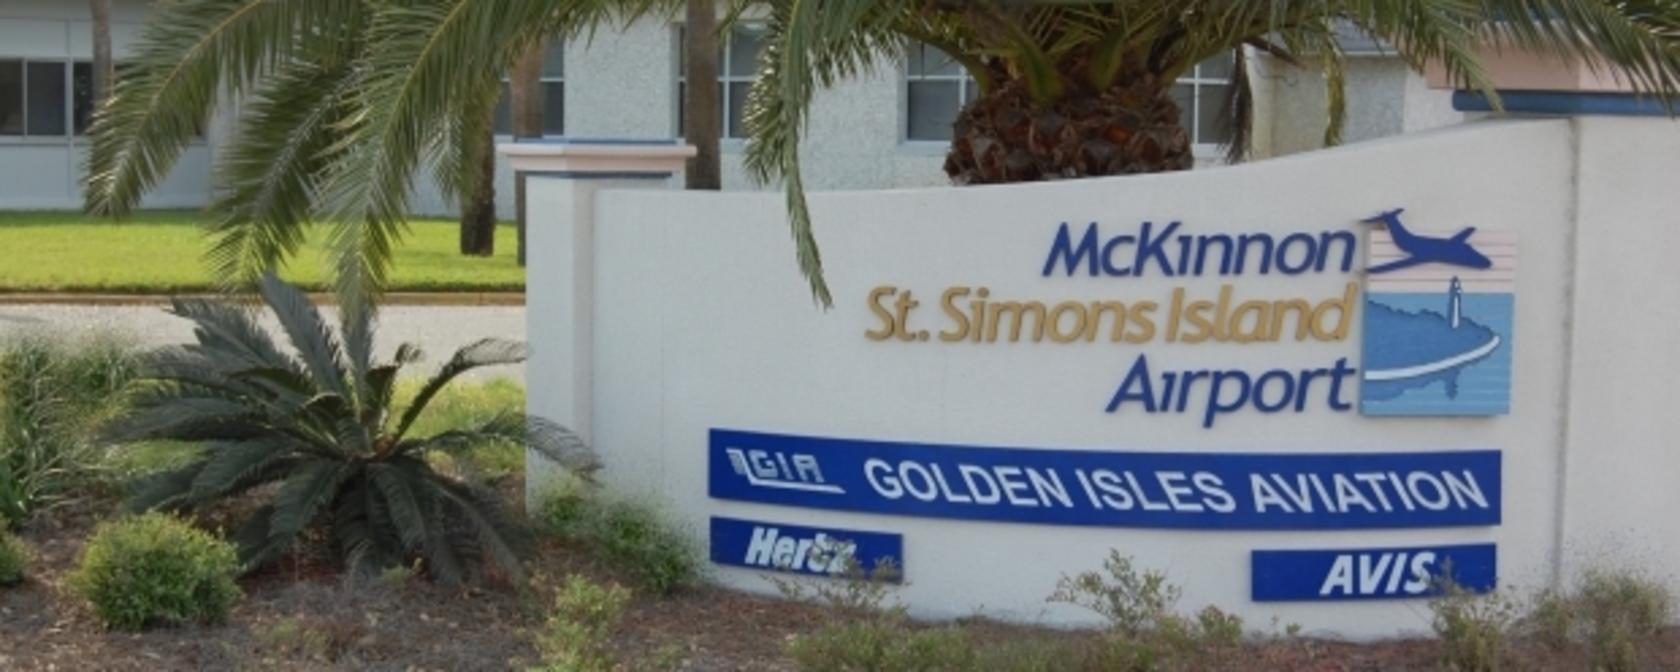 Golden Isles Aviation